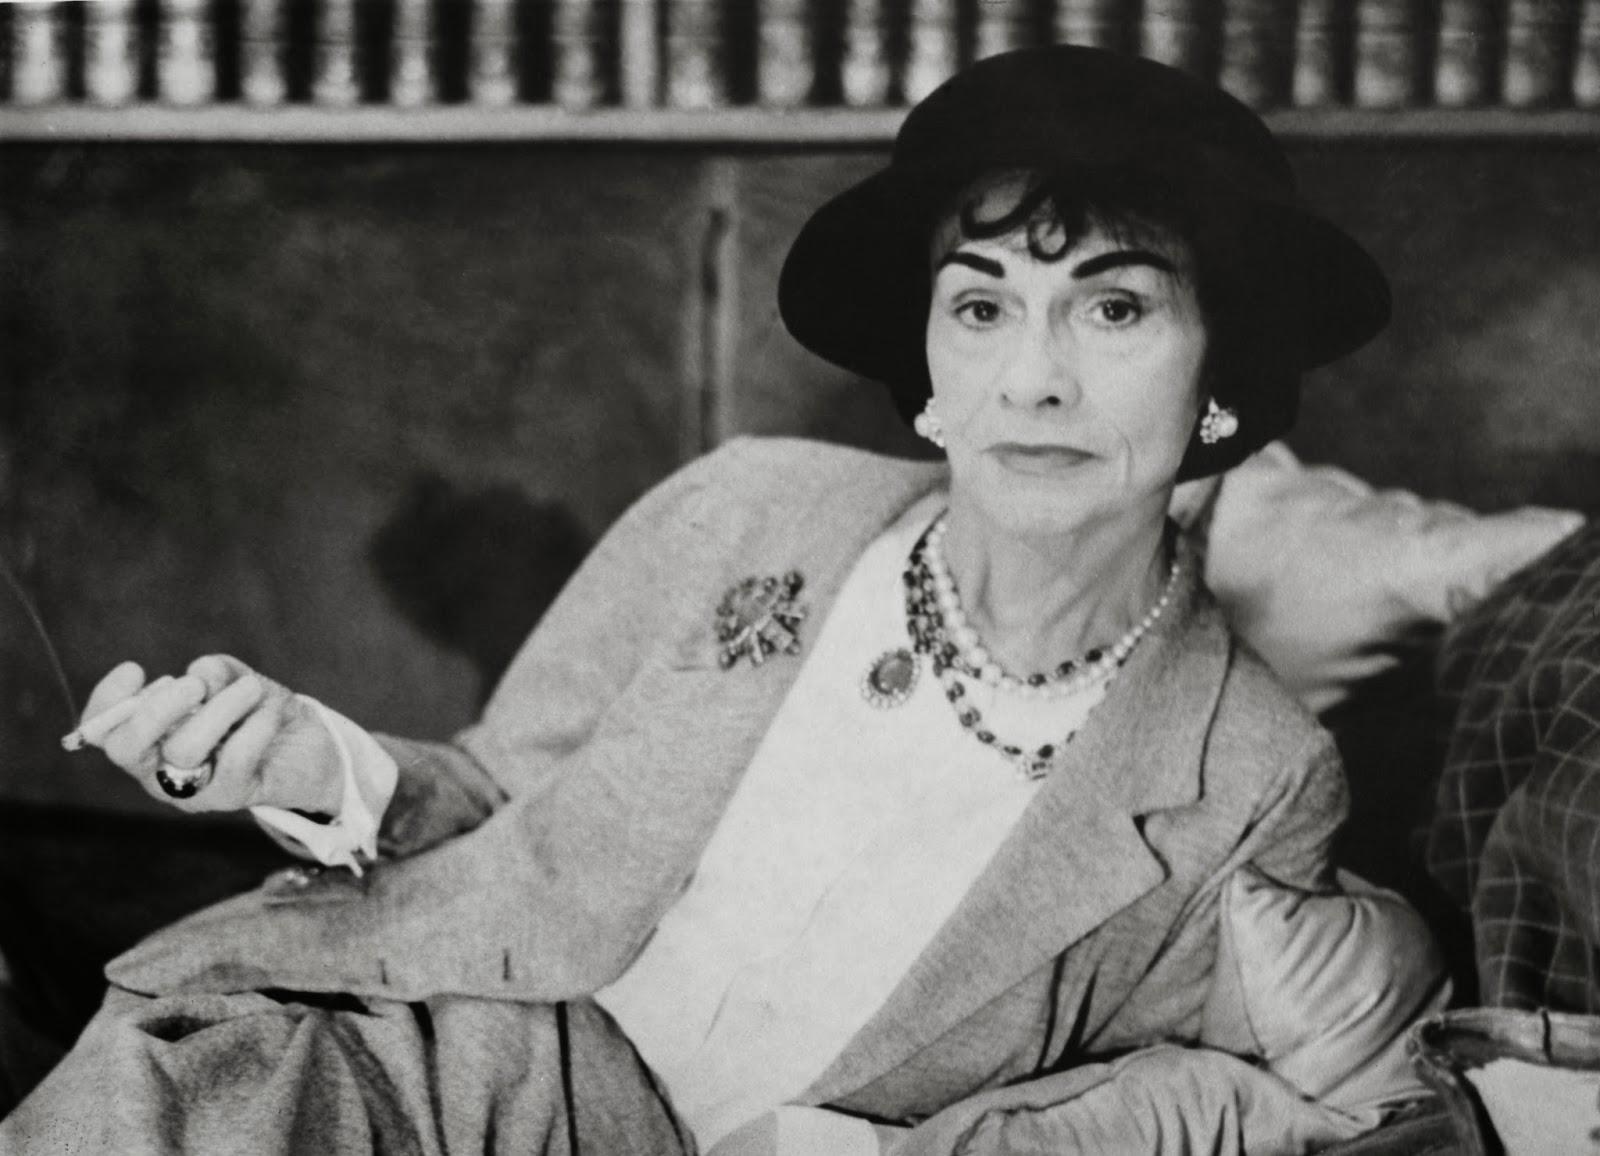 cc5df512e8 Ο ιδιοφυείς σχεδιαστής αποτίει φόρο τιμής στη Coco Chanel σκηνοθετώντας μια  ταινία αφιερωμένη στο μεγάλο της comeback το 1953